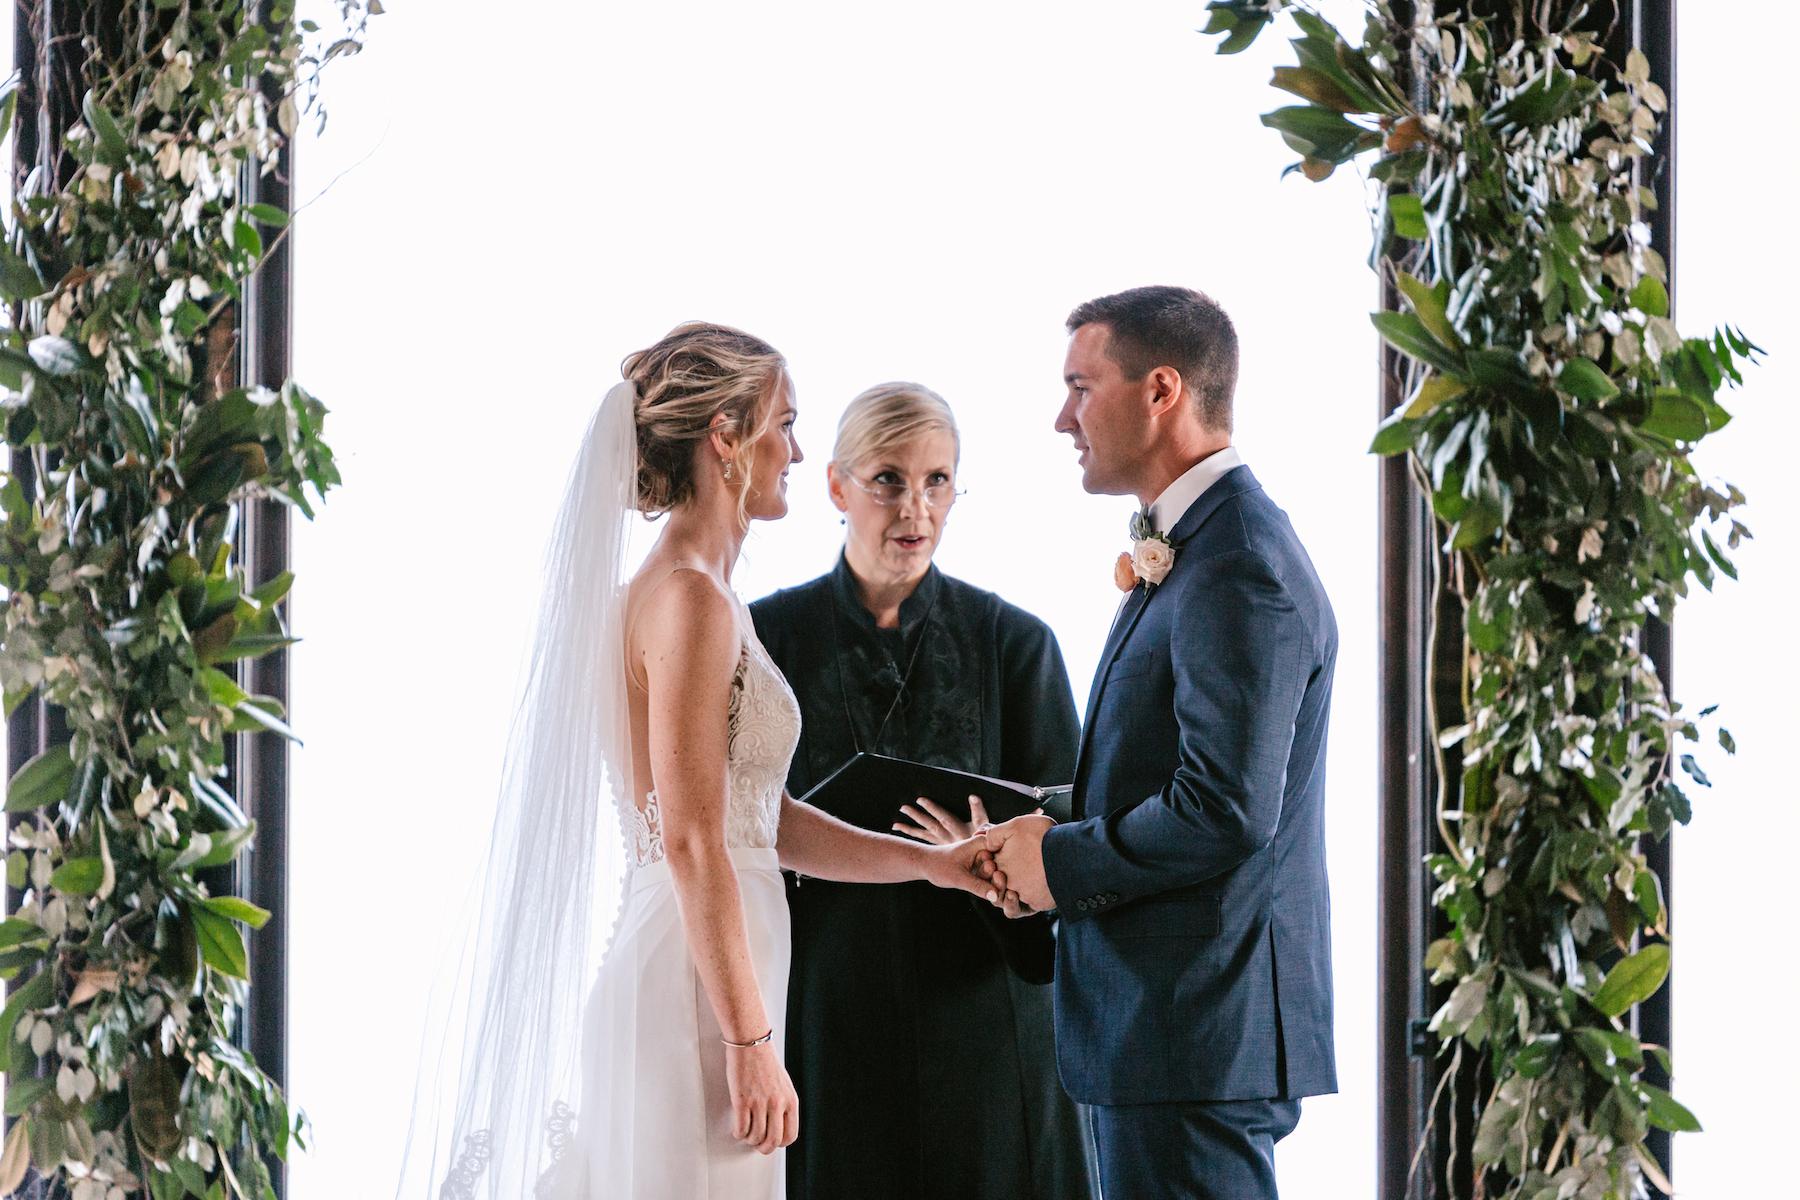 wedding-engagement-photographer-spartanburg-greenville-columbia-carolina-south-north-495.JPG